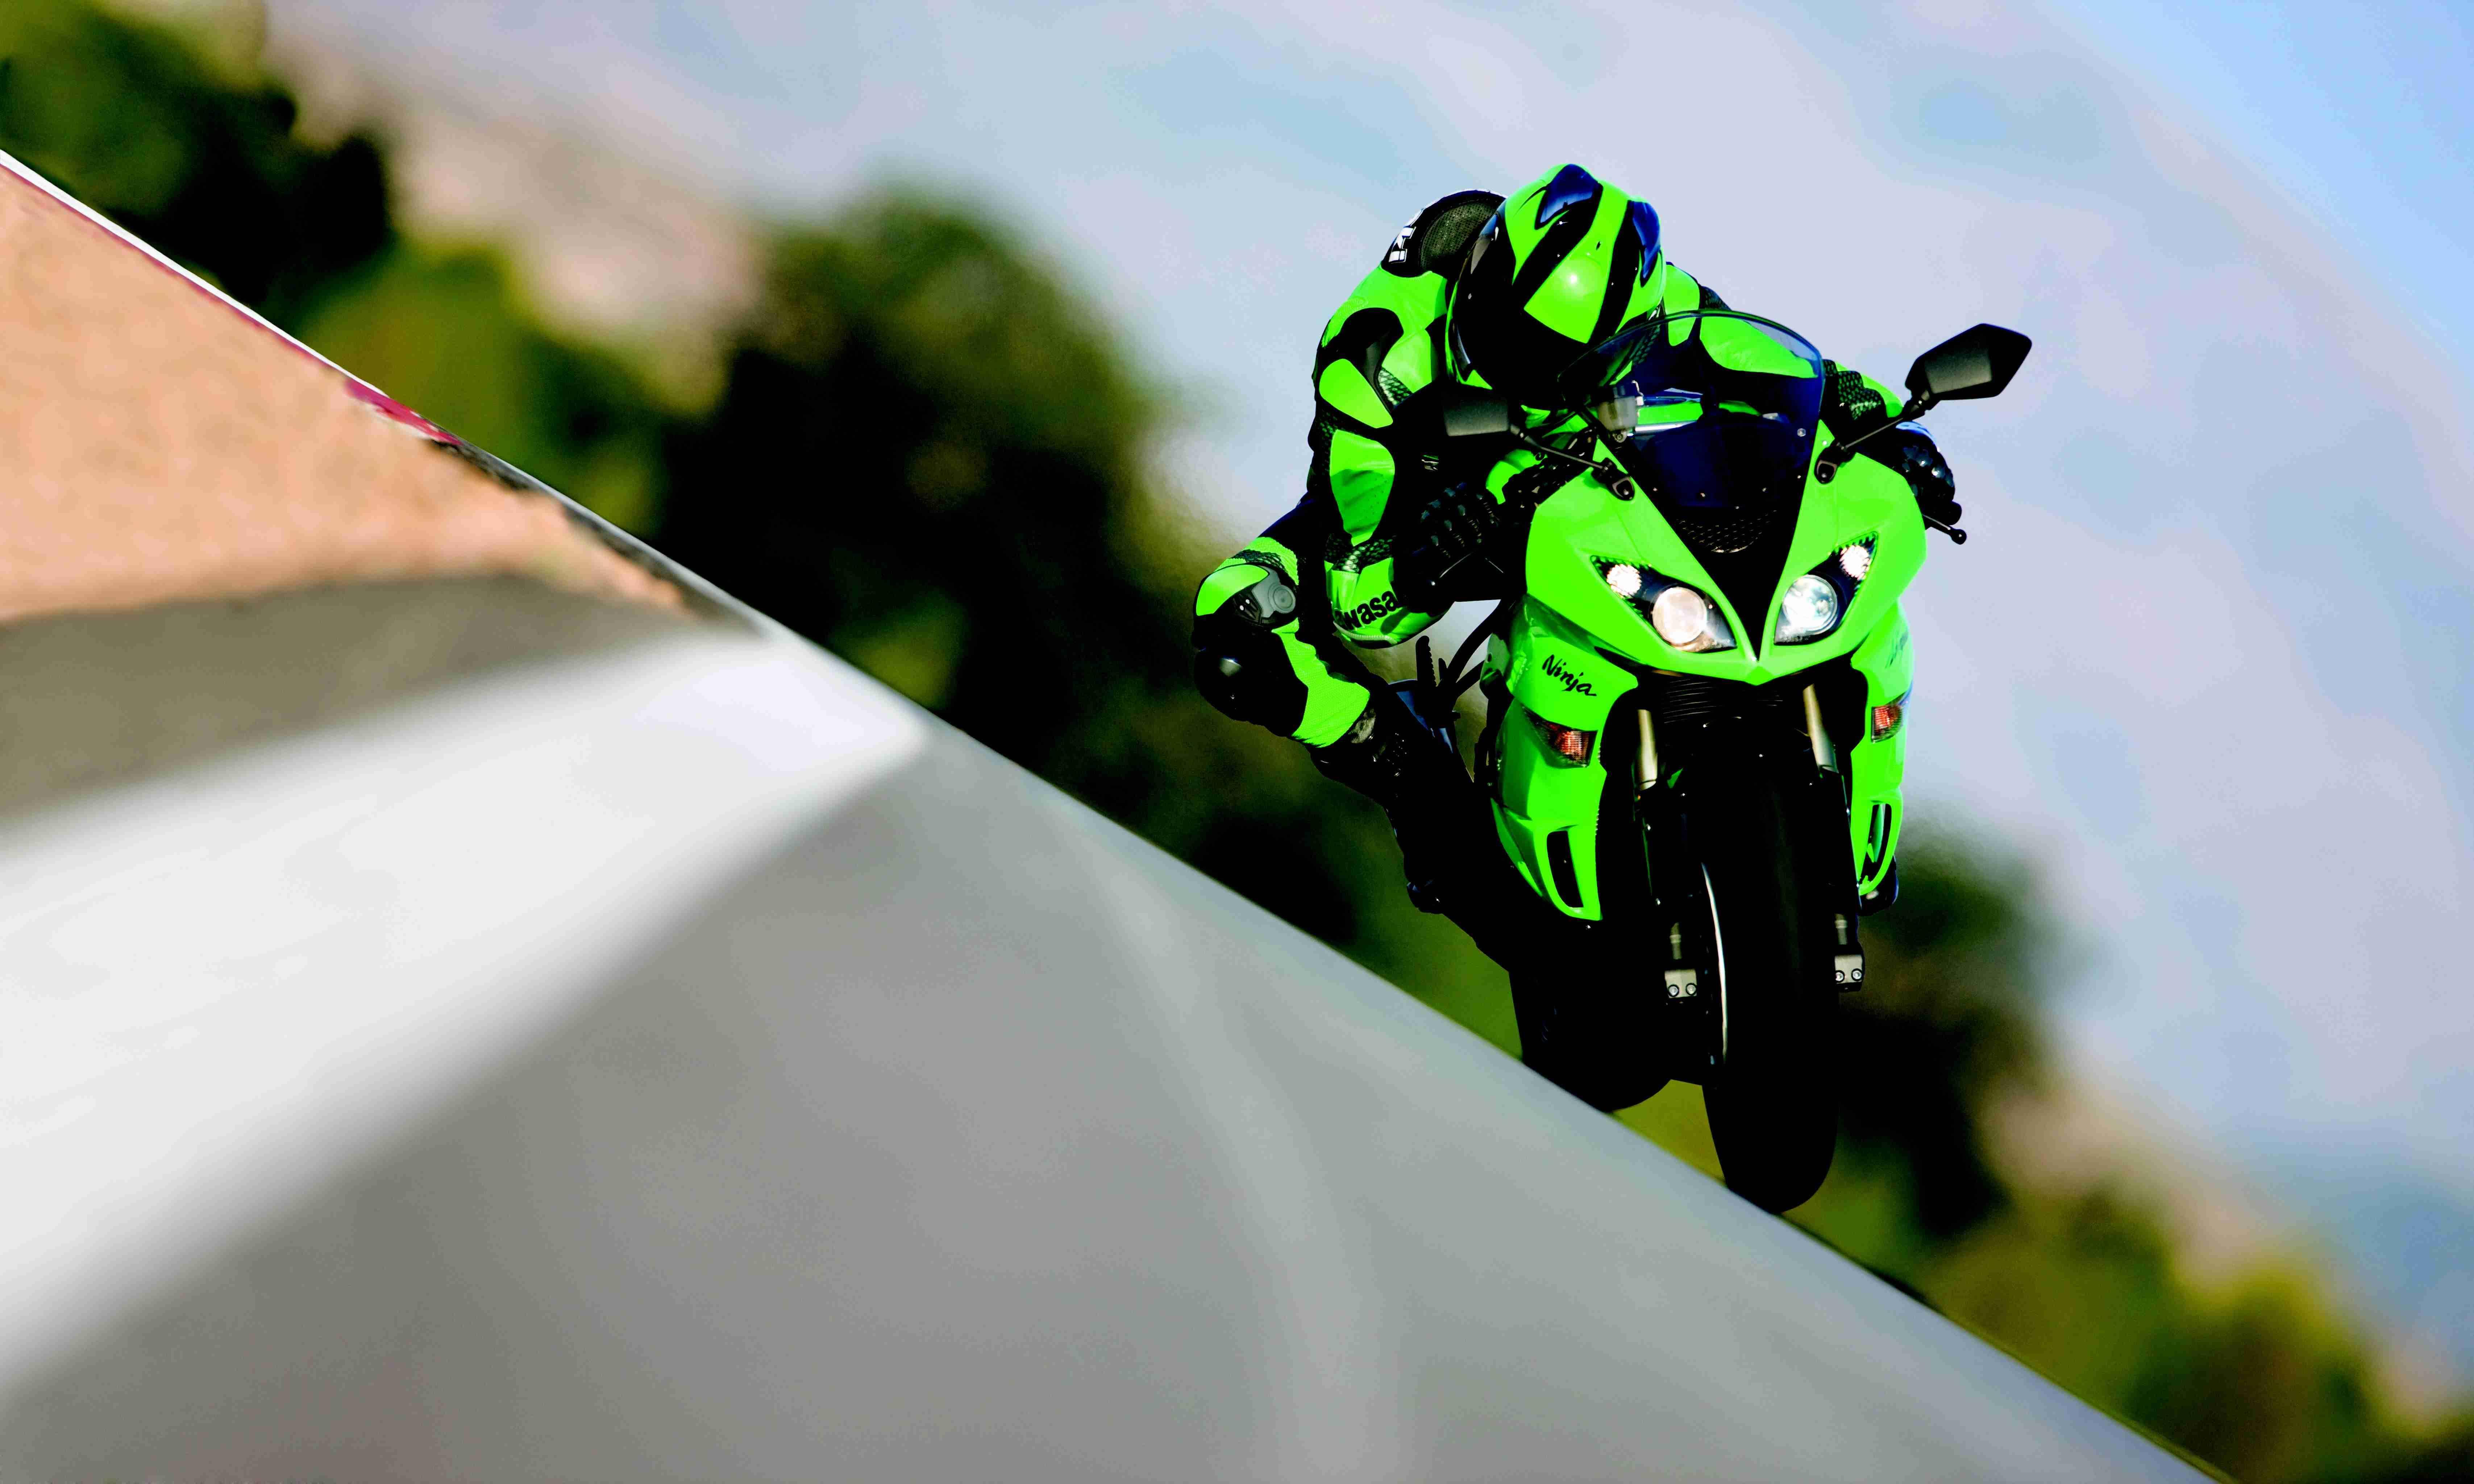 Kawasaki Ninja 68274096 Wallpaper 860446 6827x4096